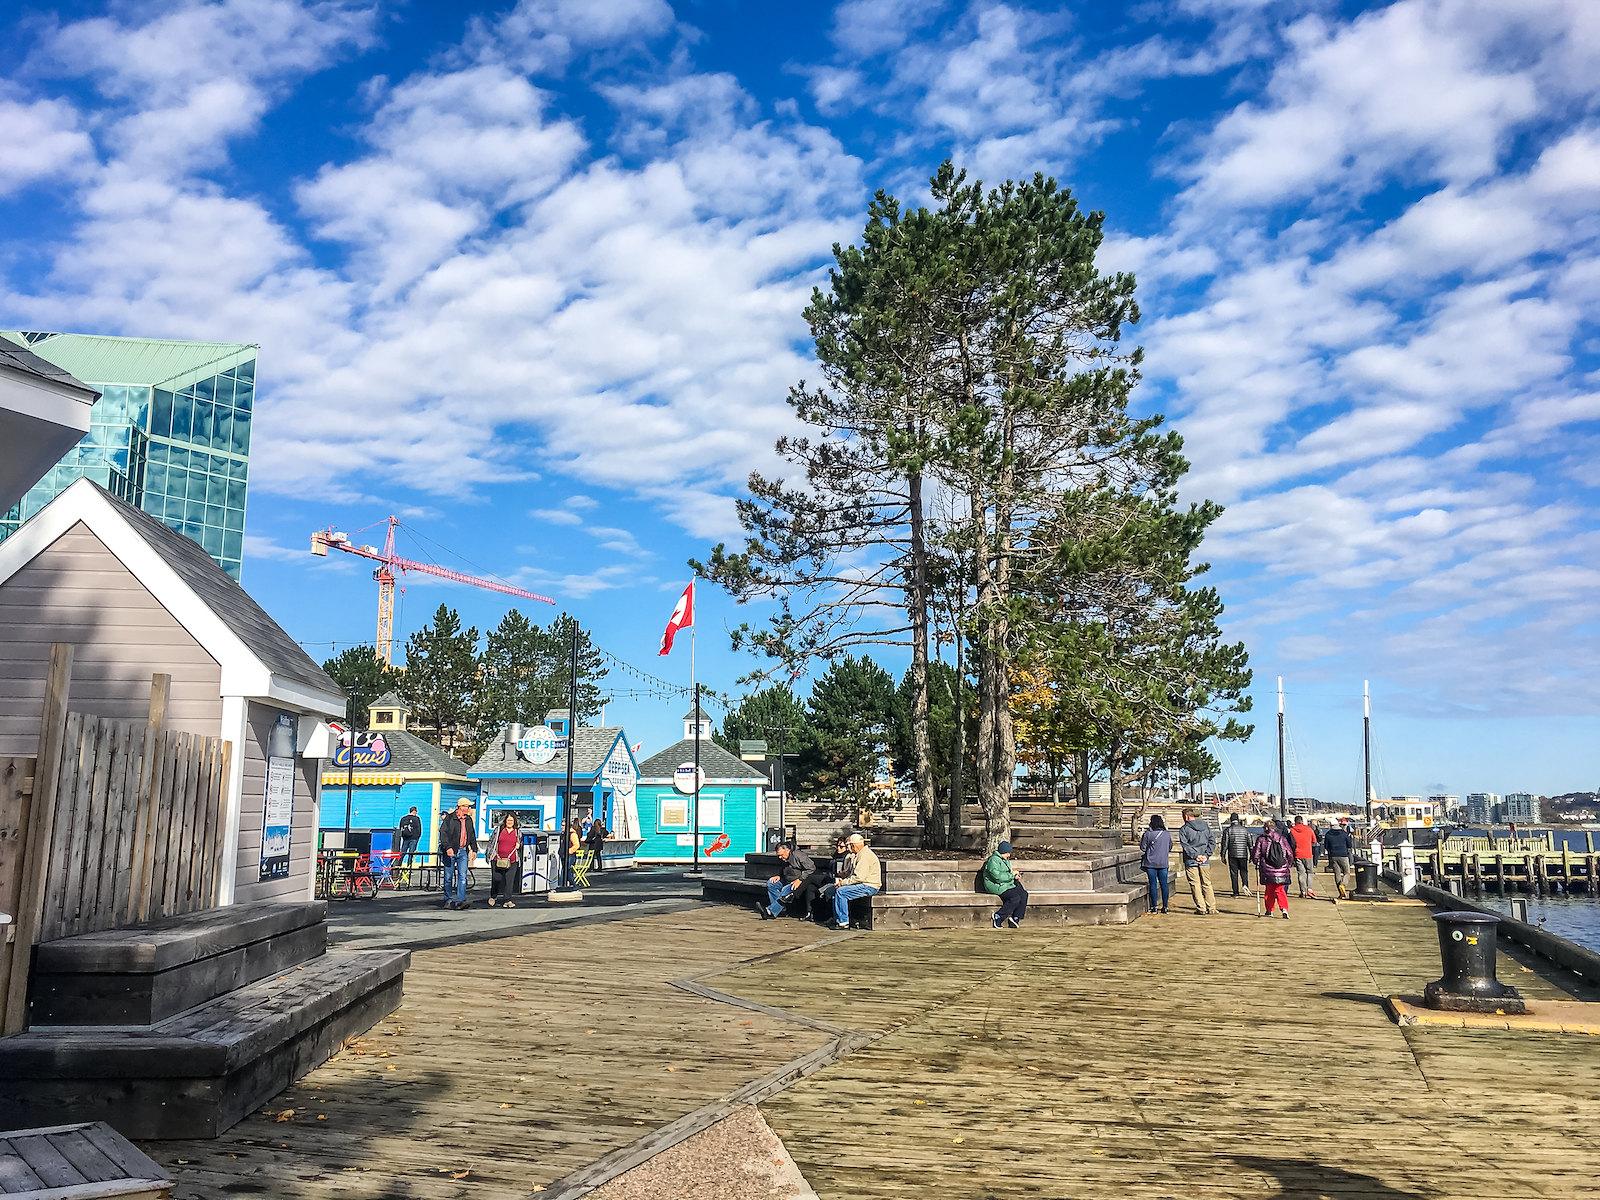 Halifax boardwalk